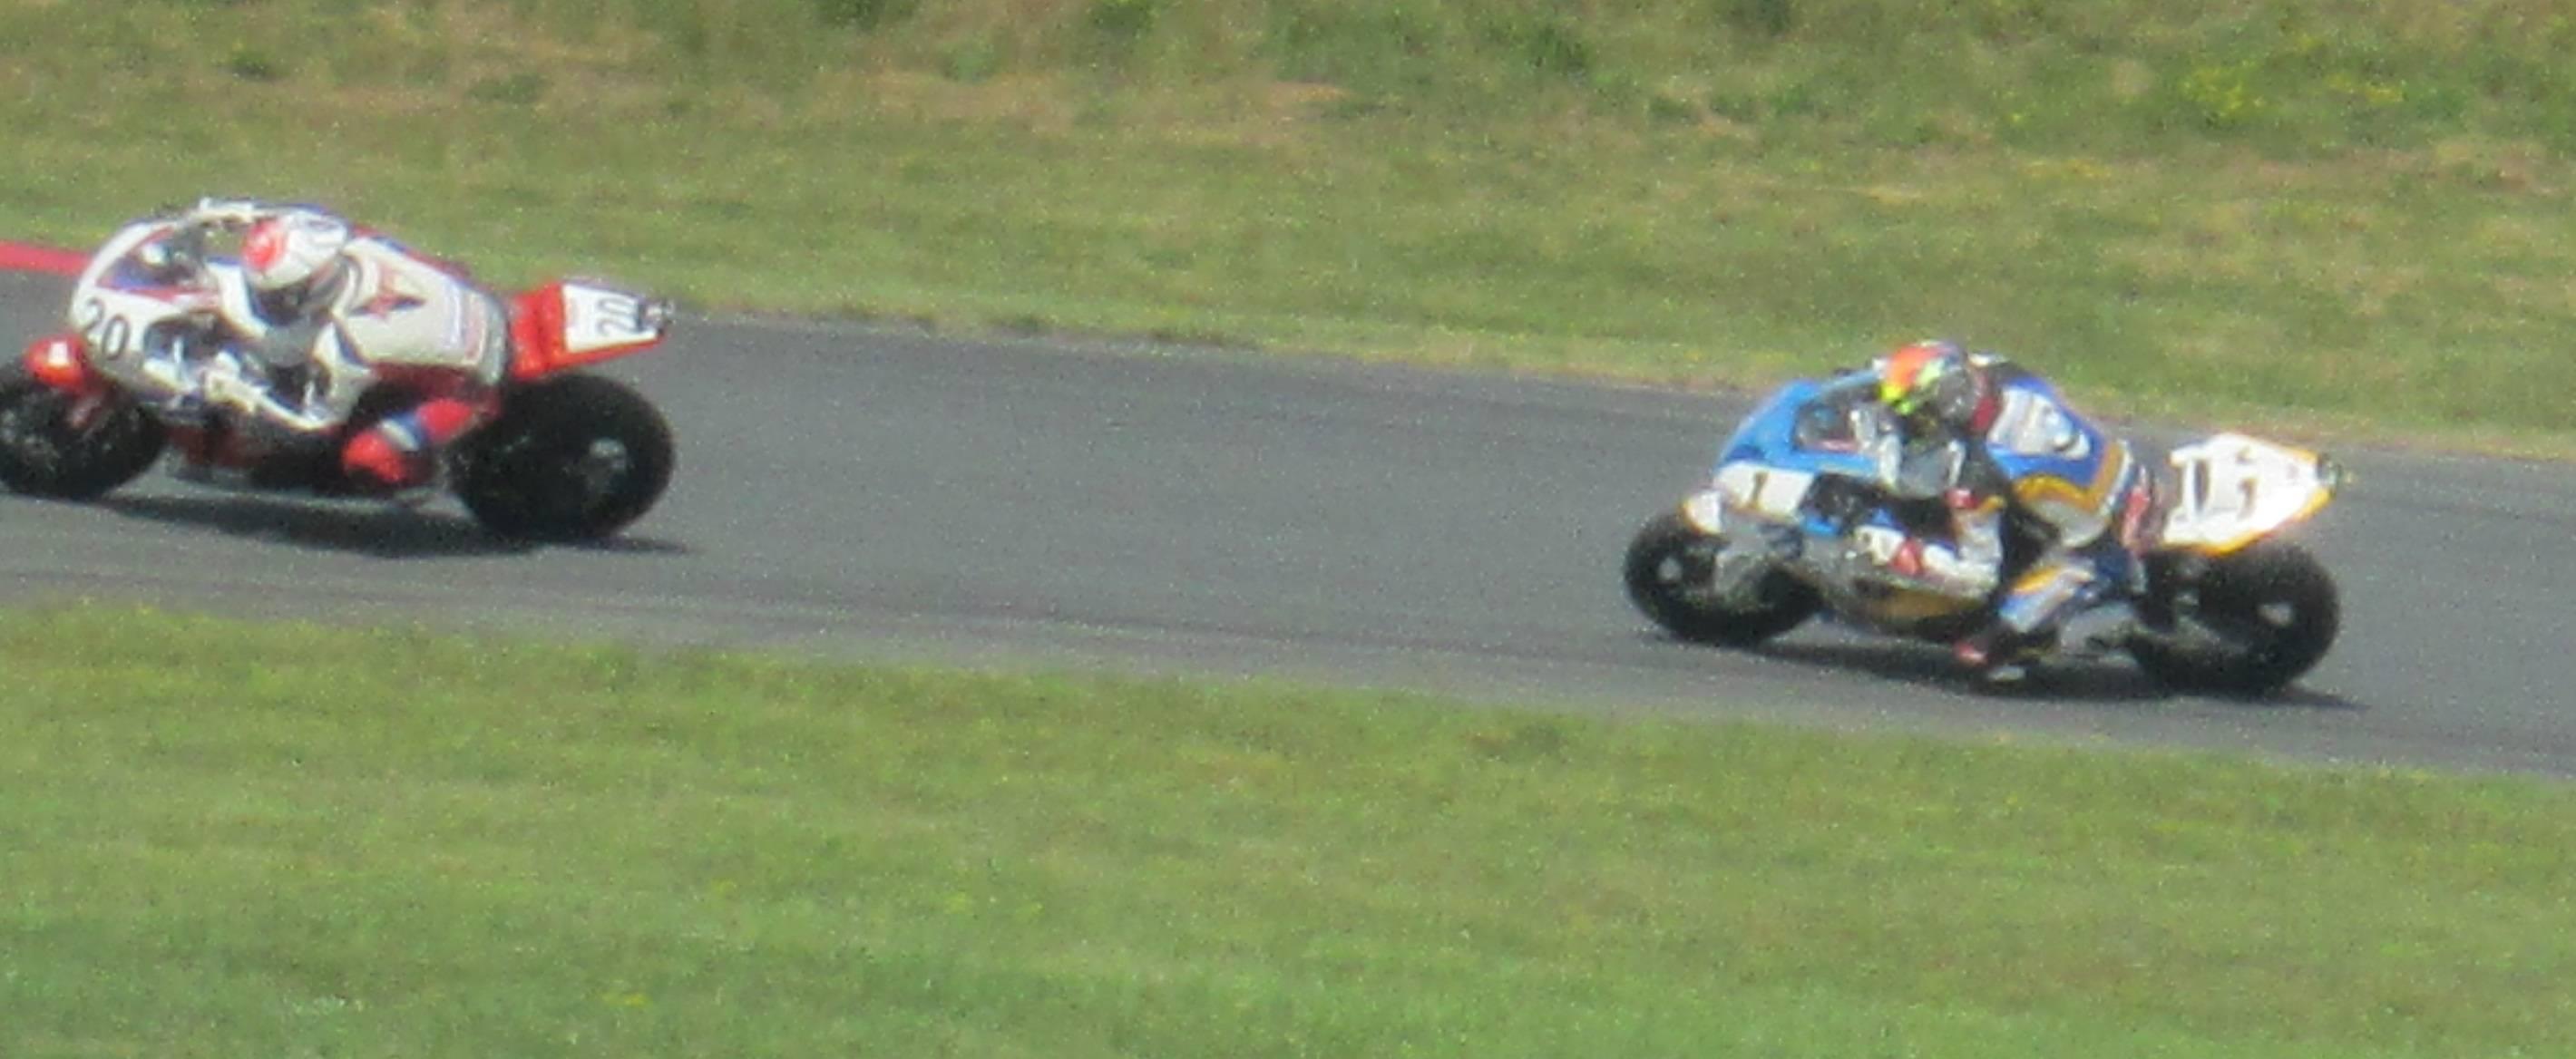 Superbikes 2014 picture number 58